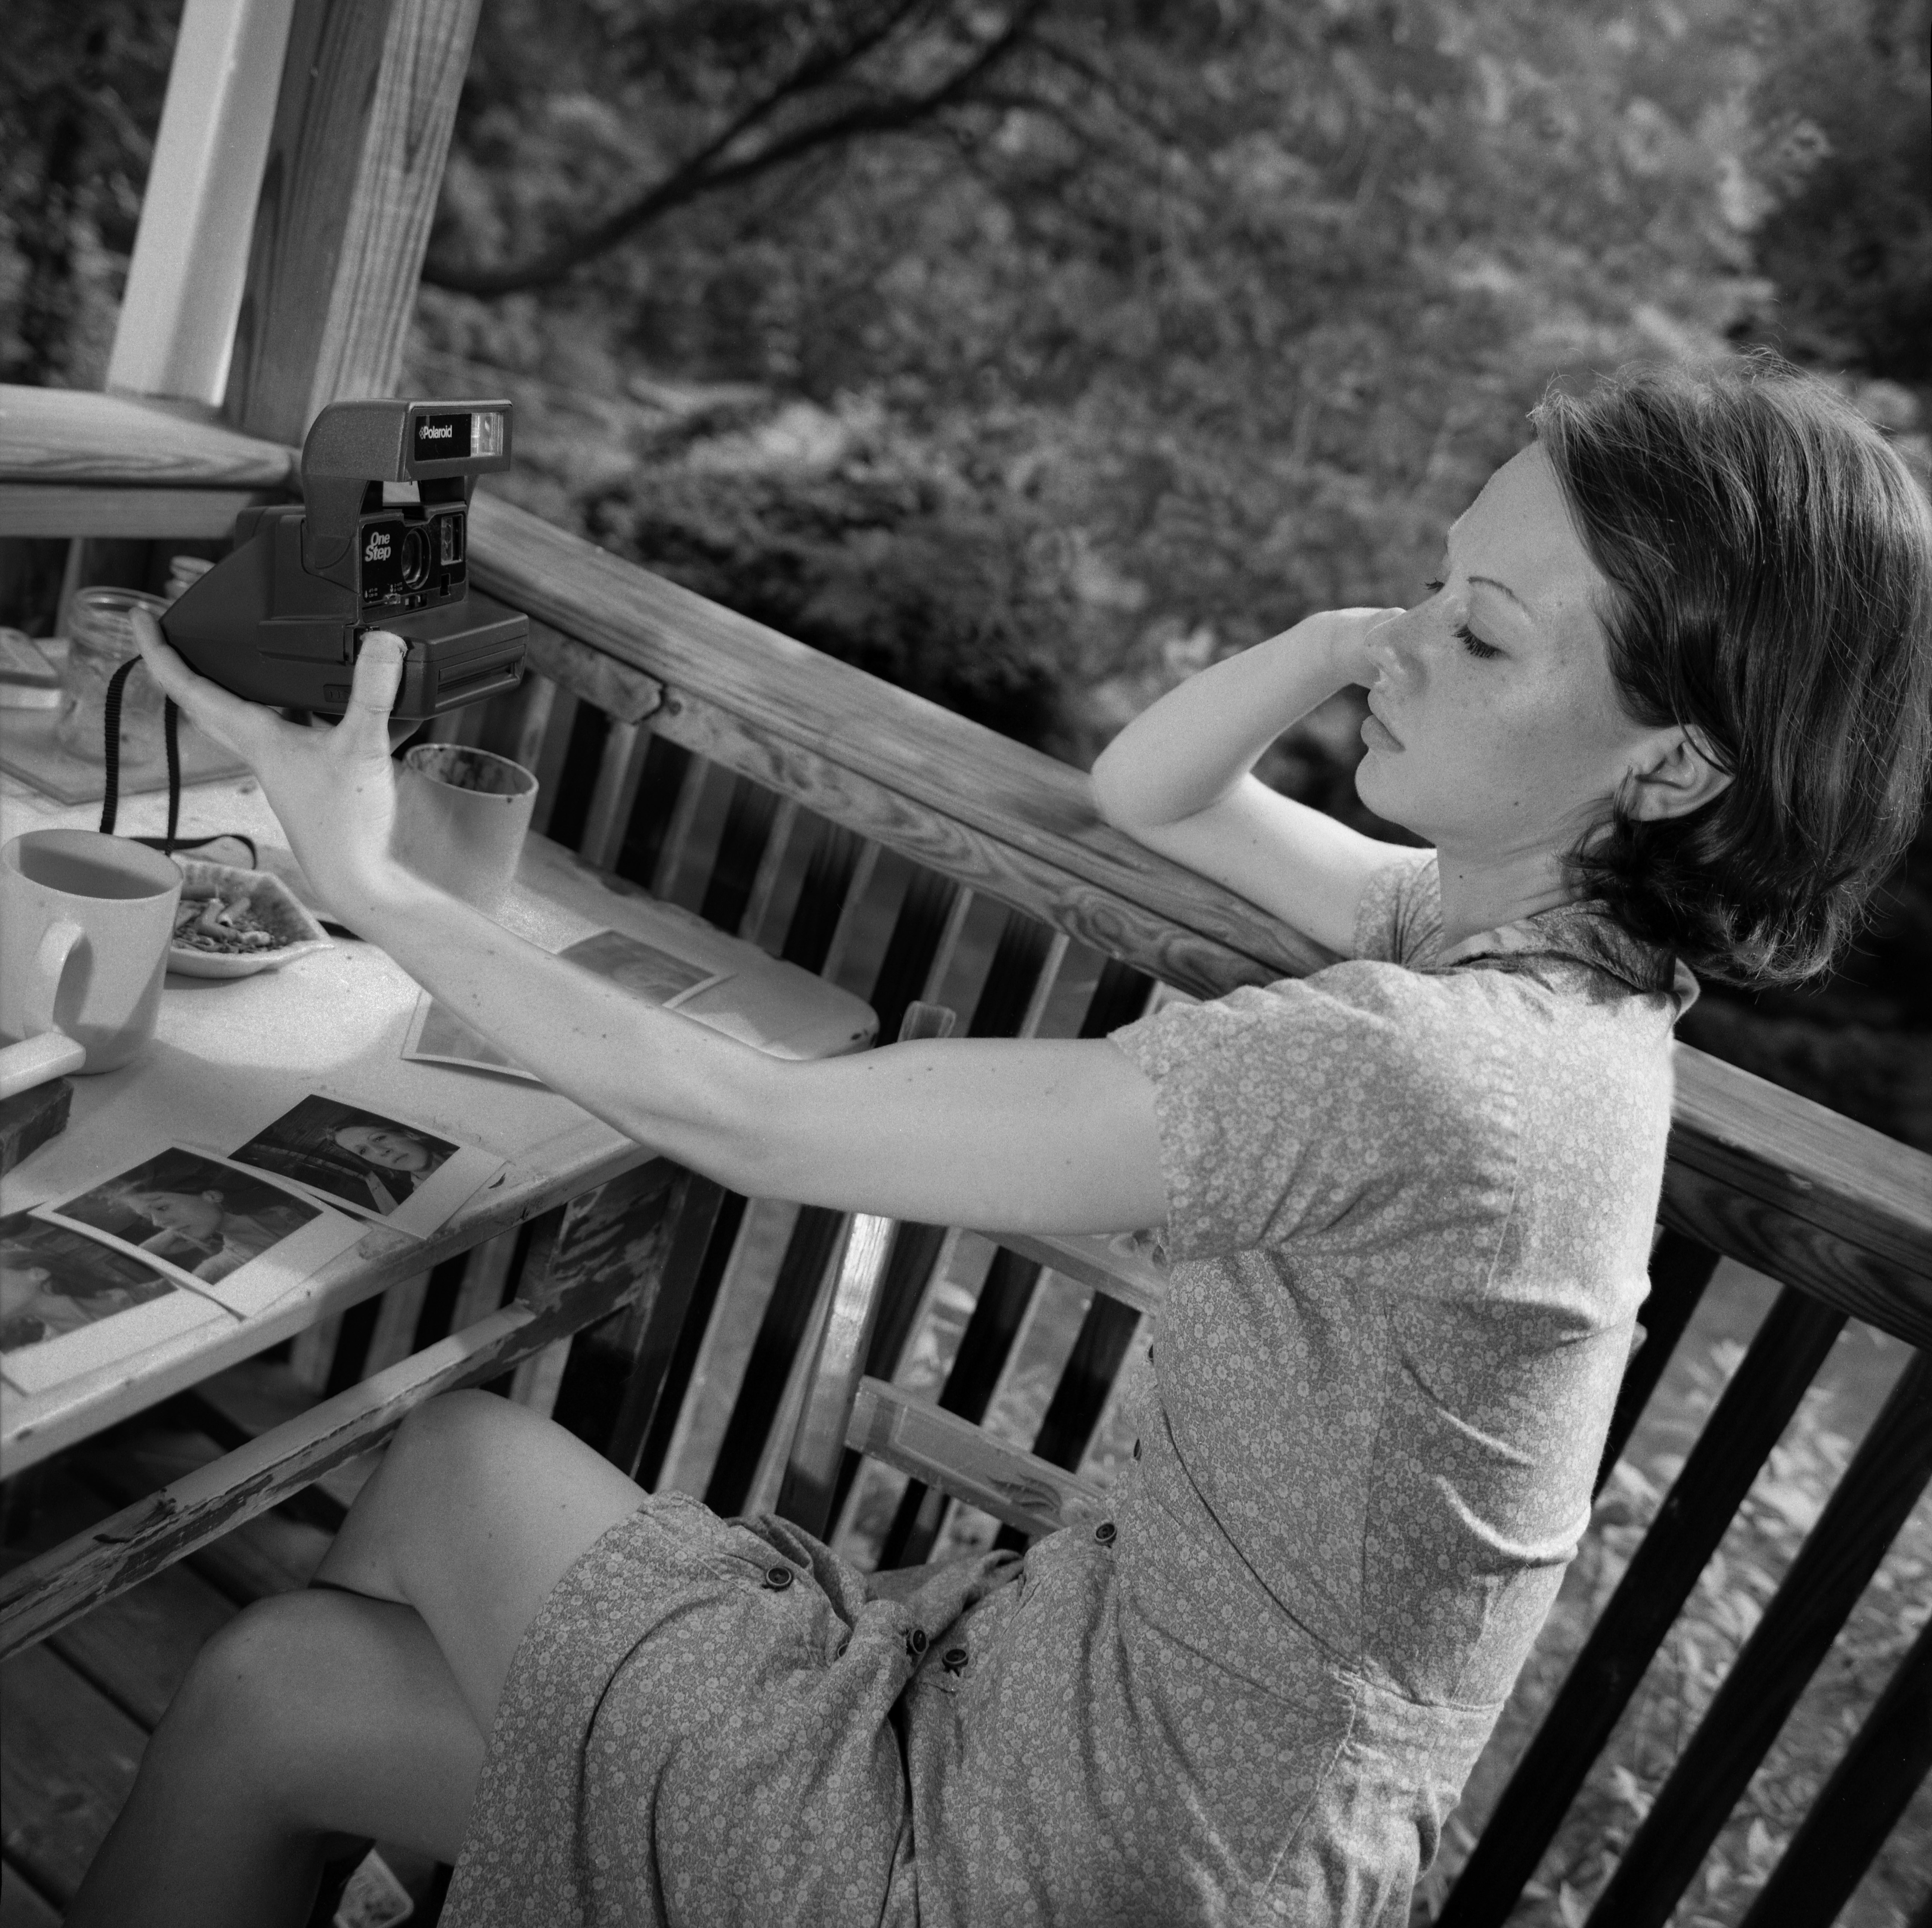 2001 Alison, Self Portrait, Occoquan, VA